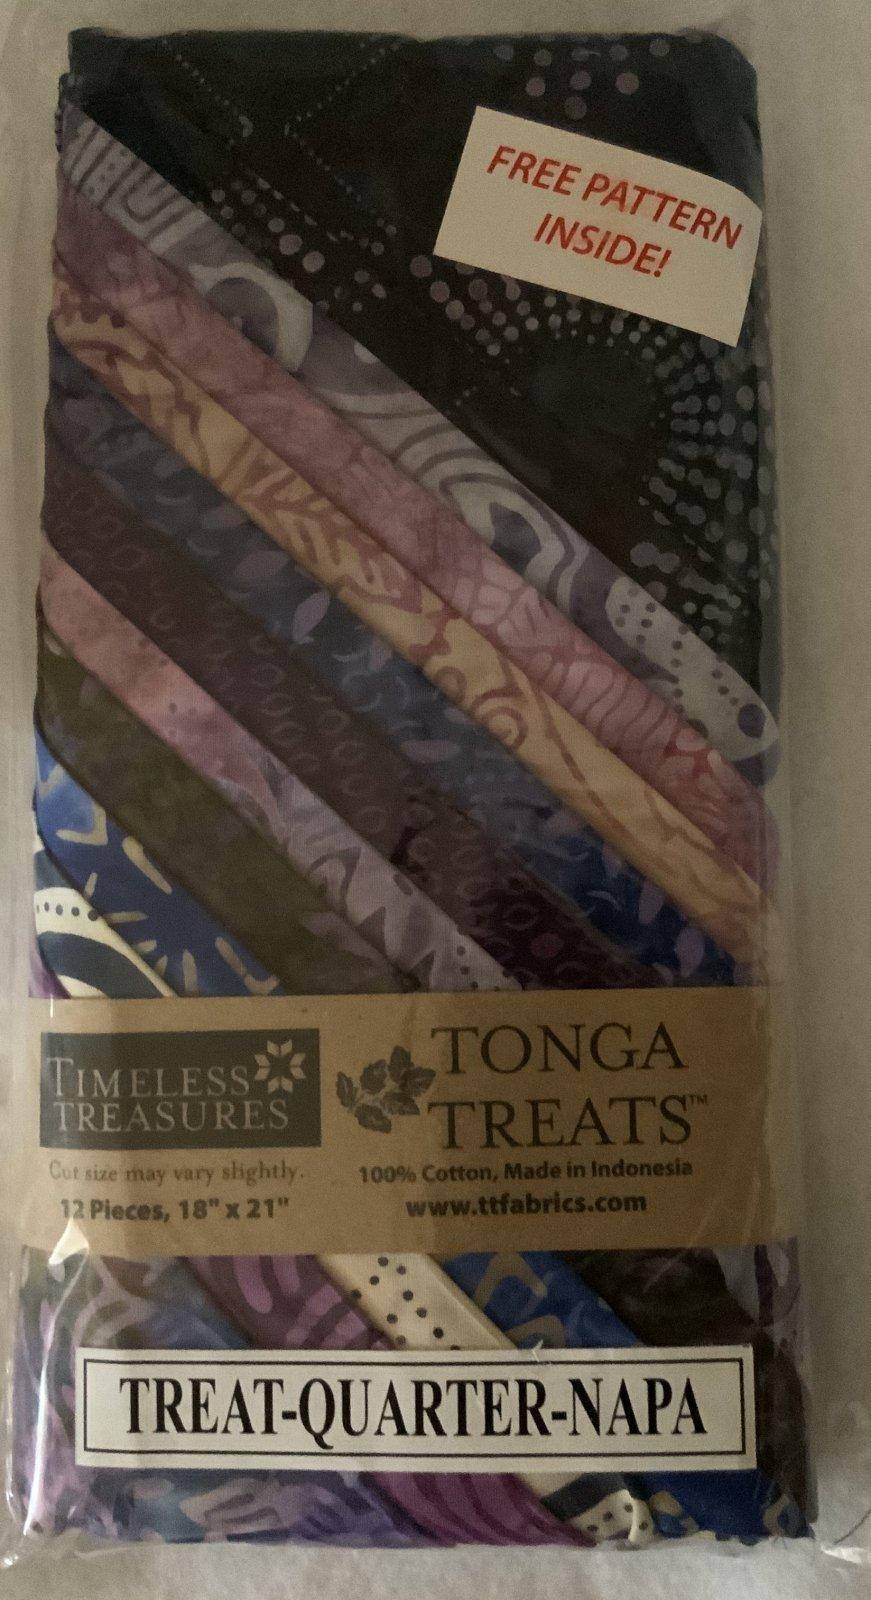 Tonga Treat Fat Quarters Napa (18in x 21in) 12pcs - Timeless Treasures